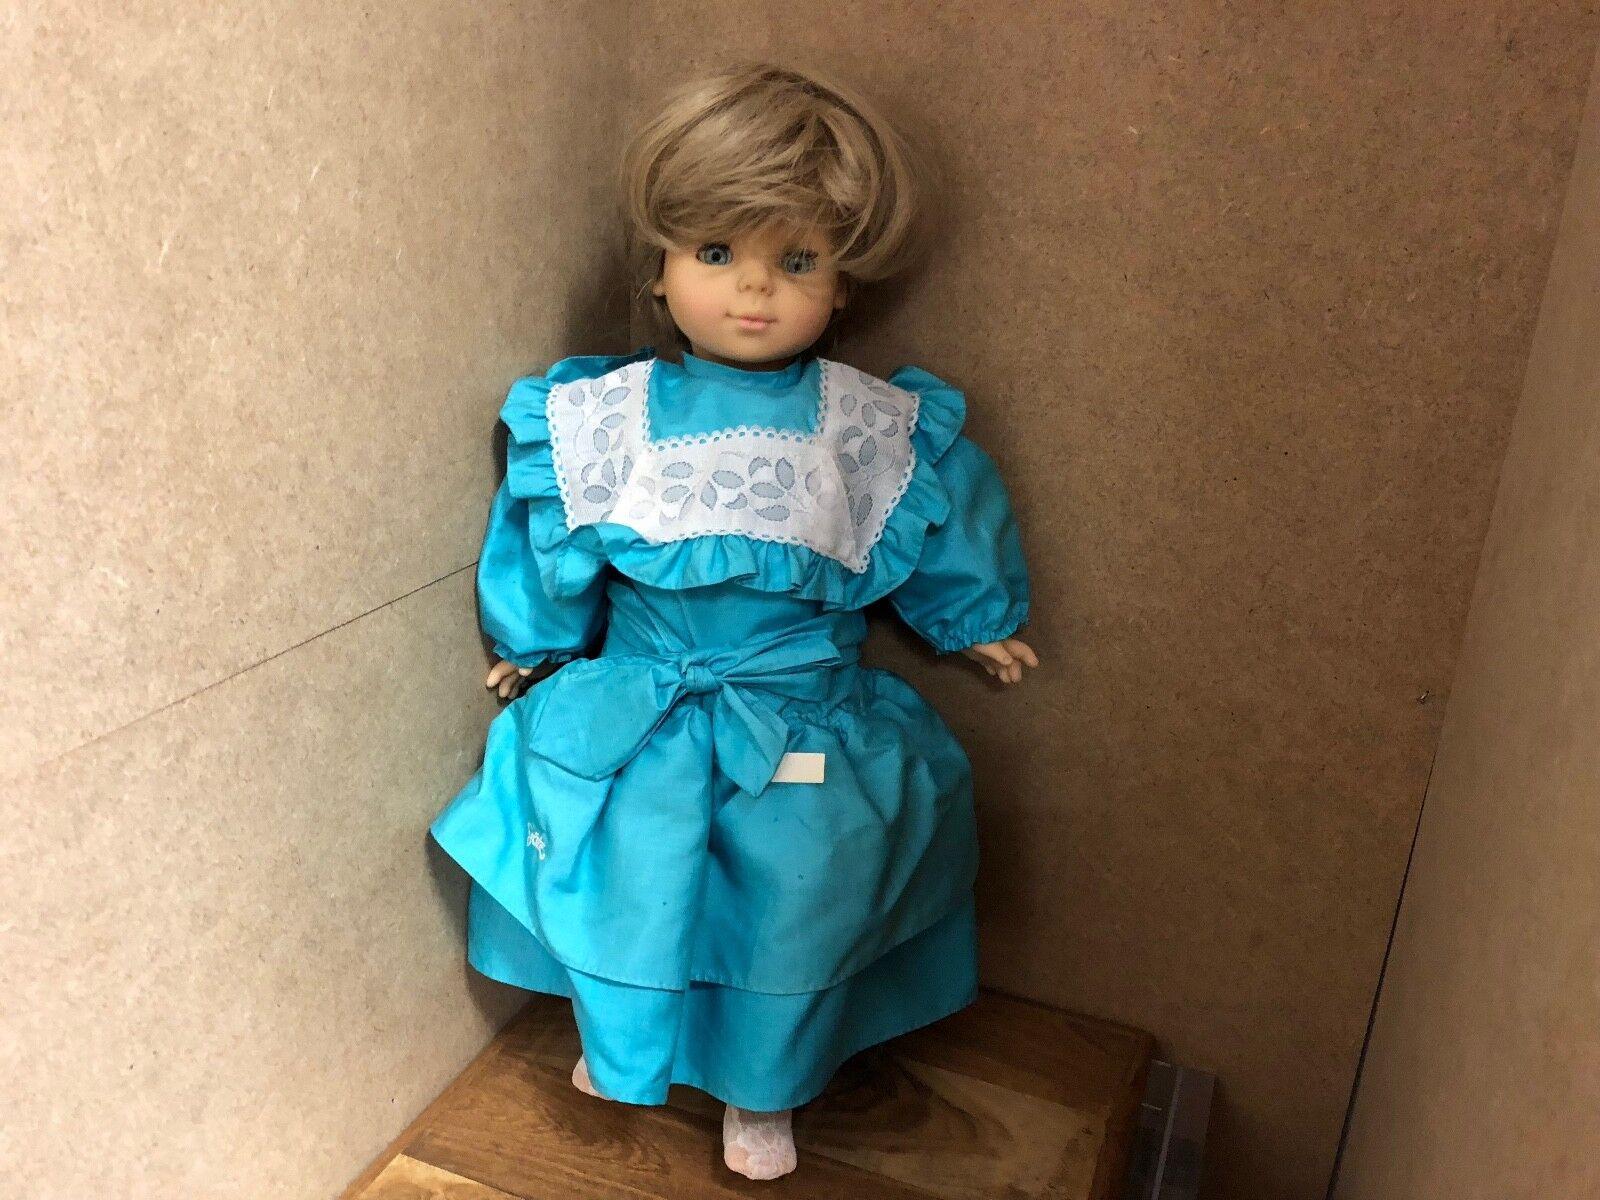 Vinyl Puppe 45 cm. Top Zustand